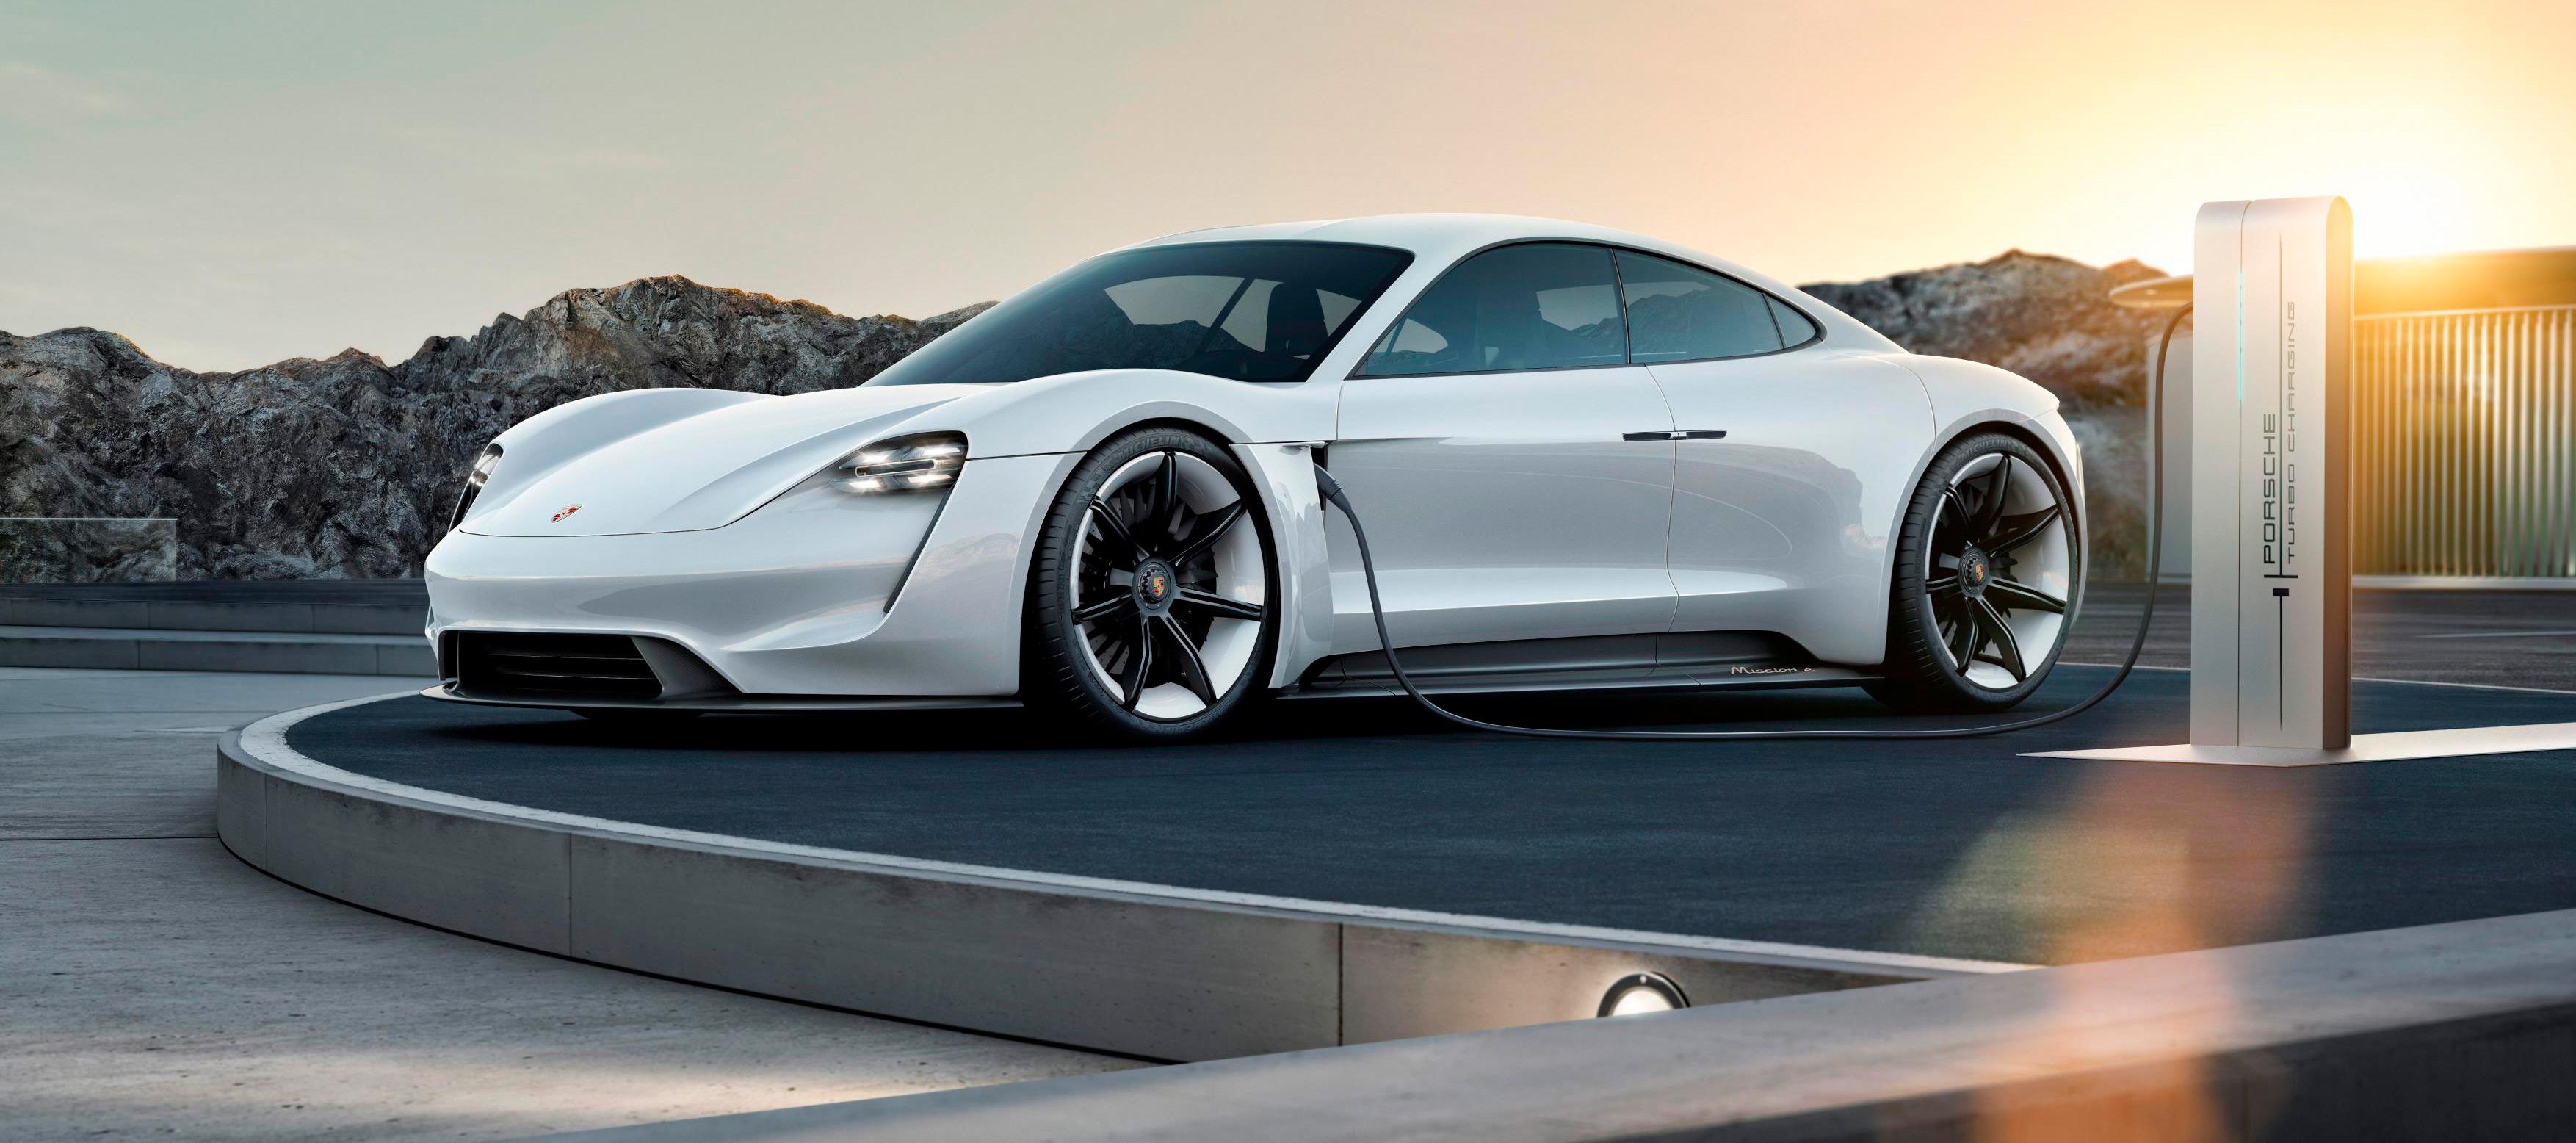 El Porsche taycan despierta mucho interés